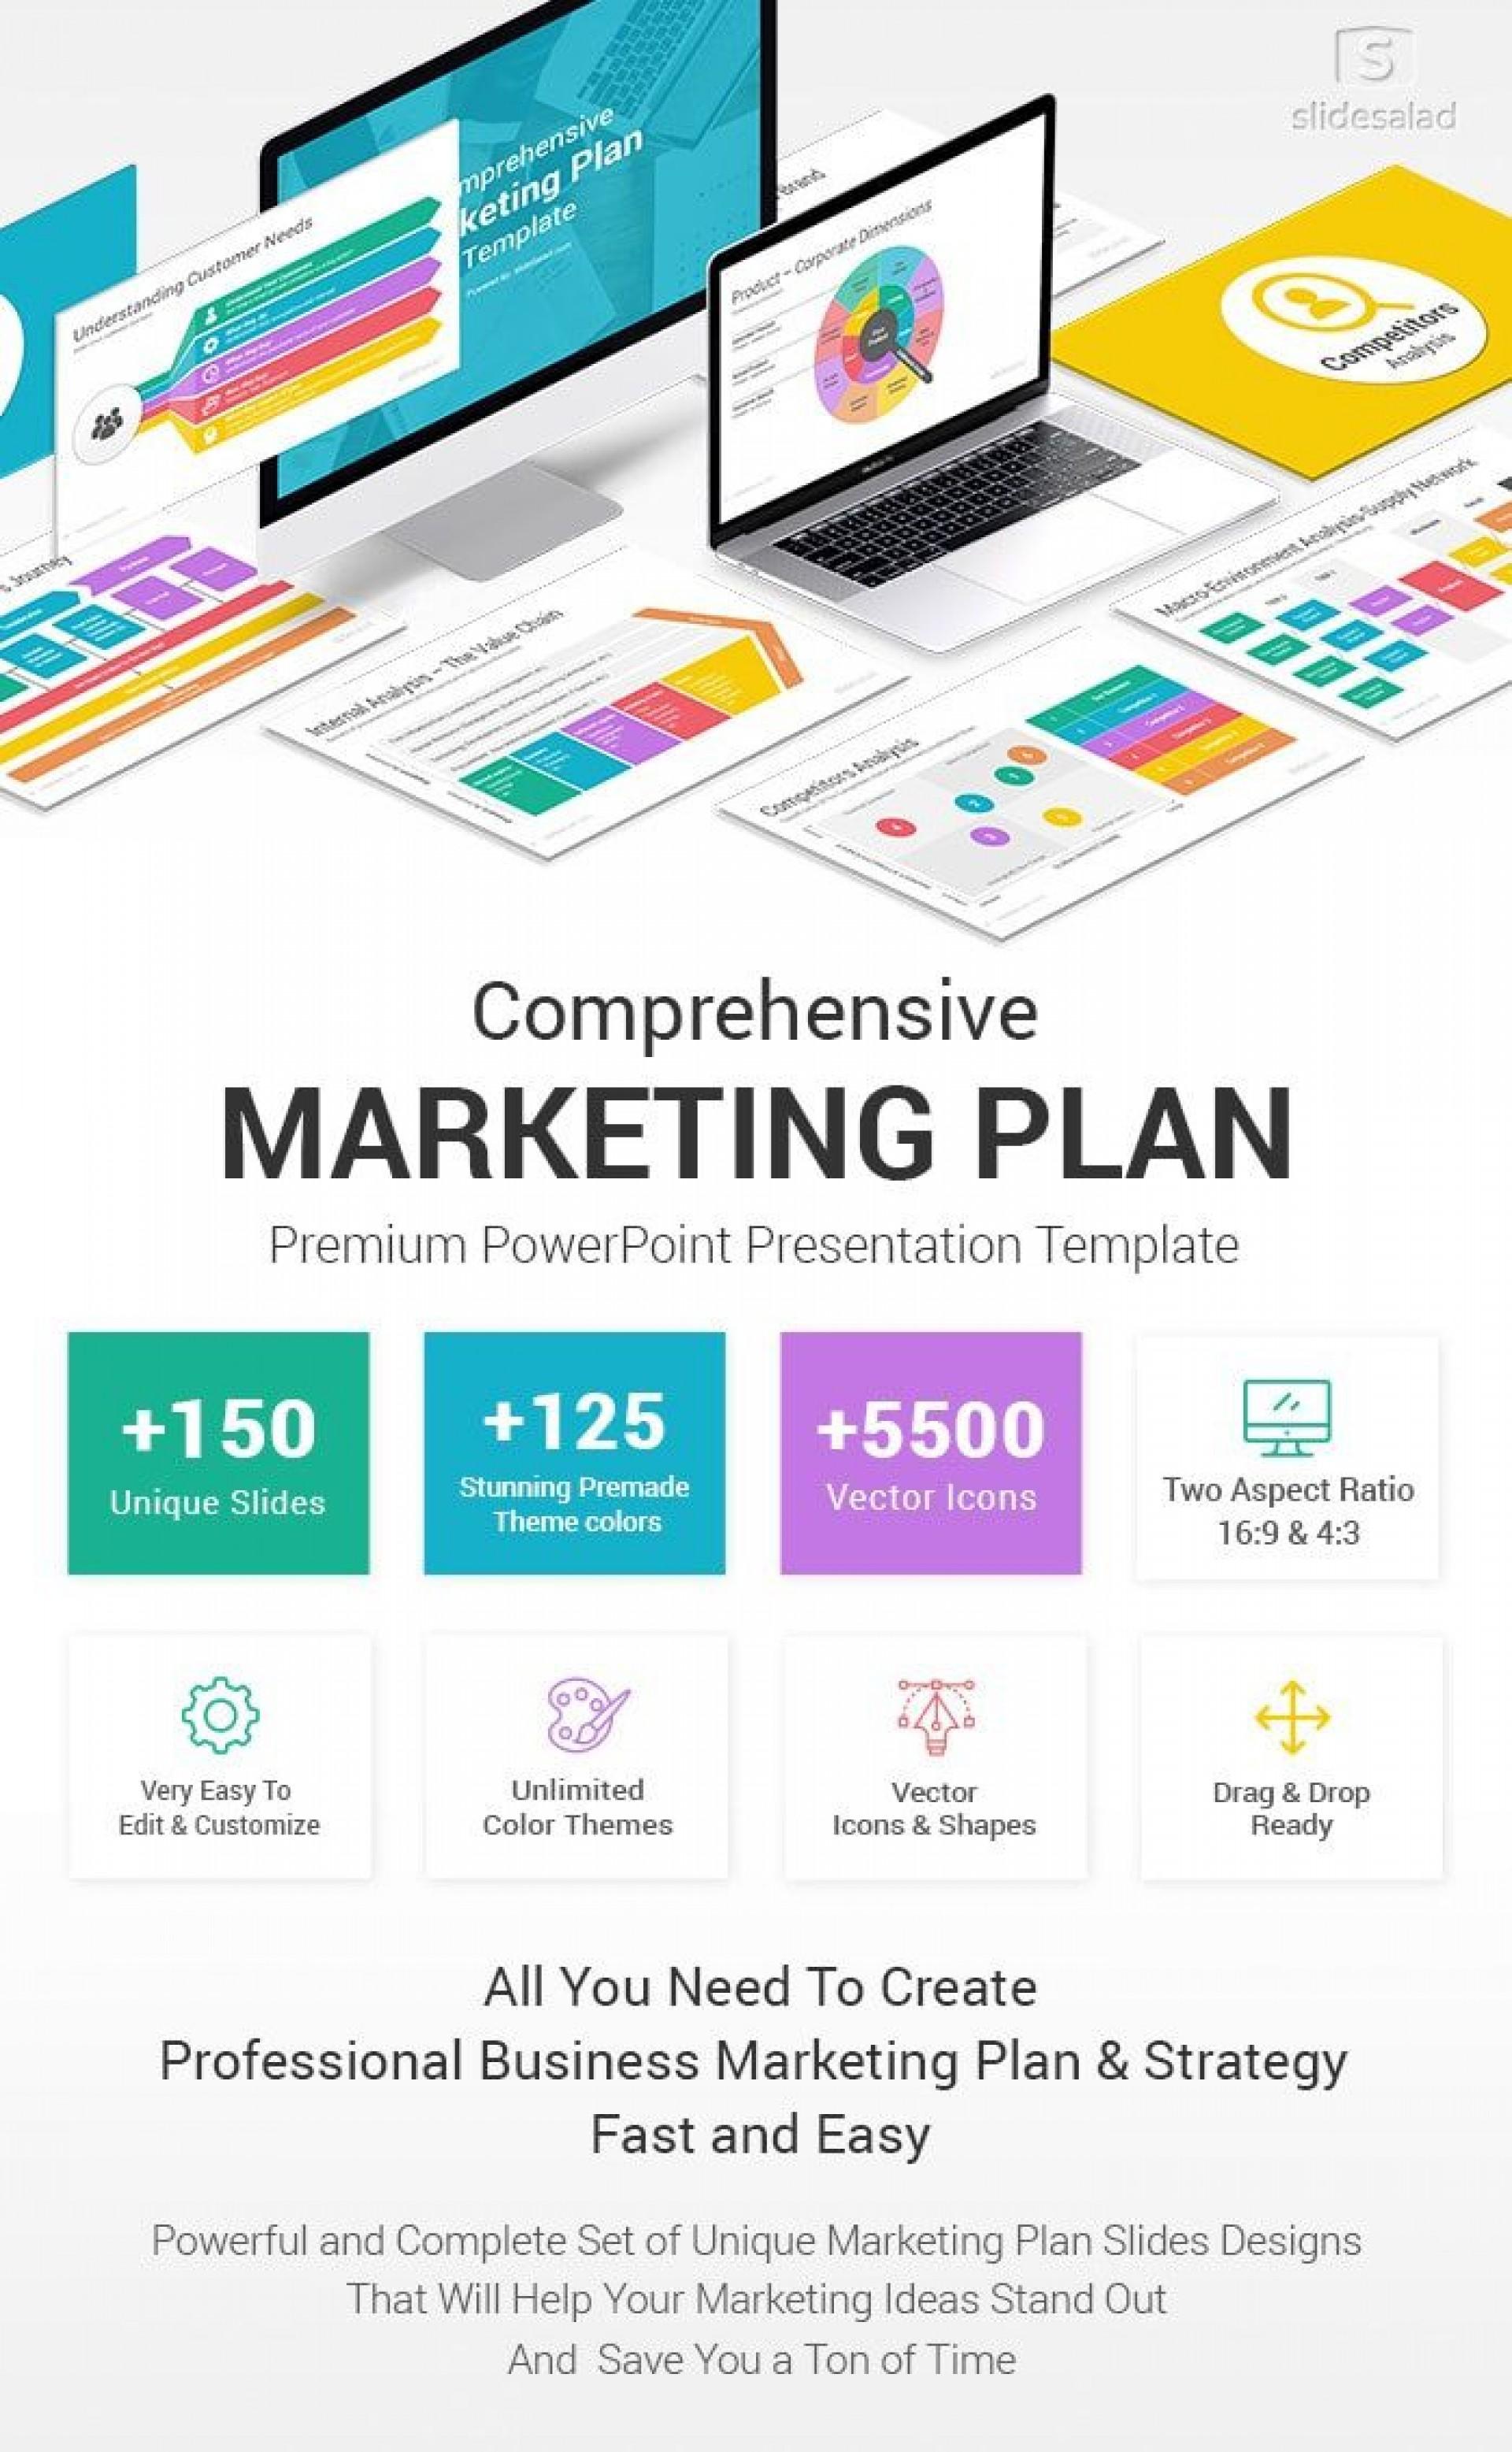 009 Phenomenal Free Digital Marketing Plan Template Ppt Sample 1920